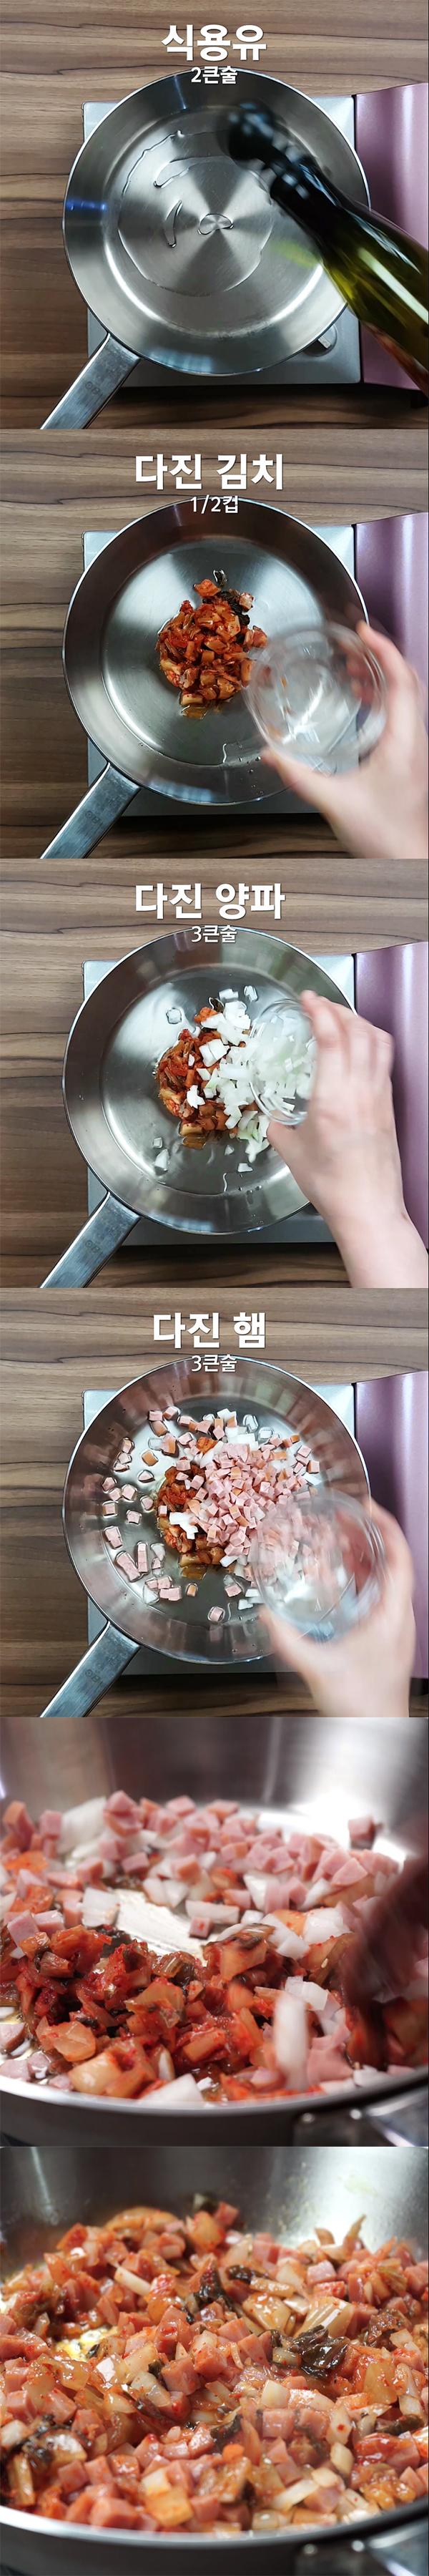 gold-recipe-of-kimchi-fried-rice 03